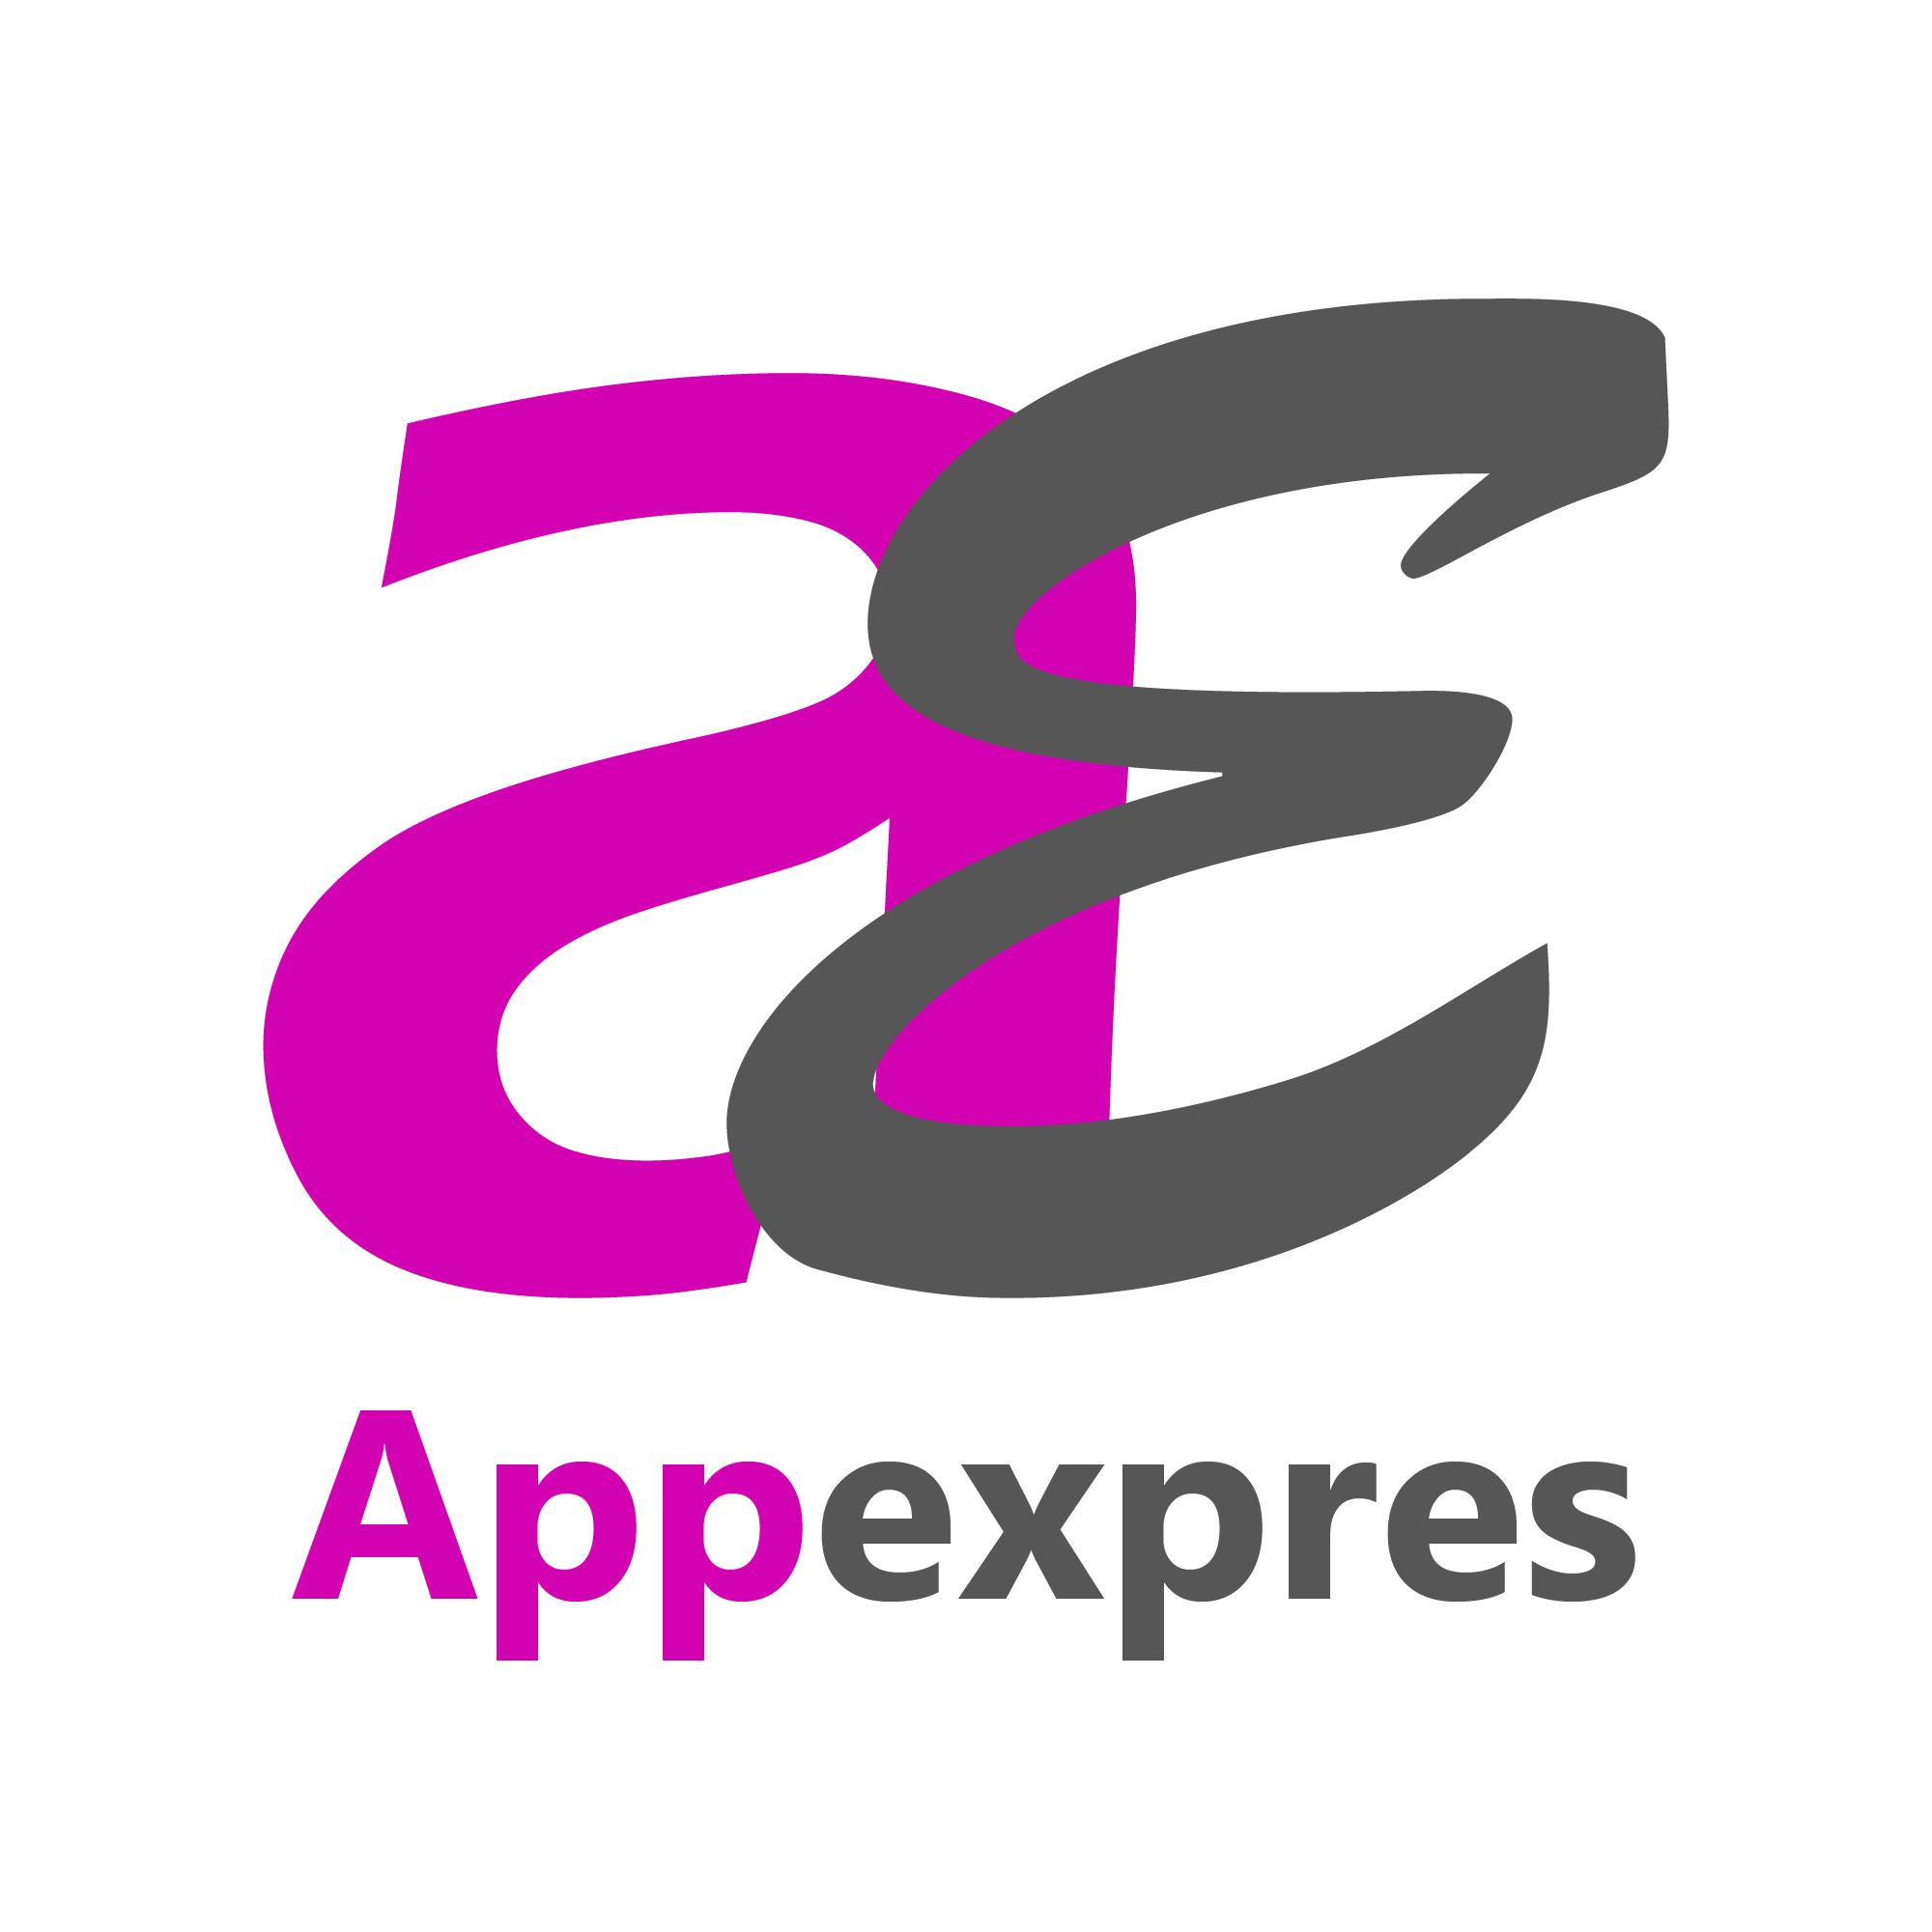 Appexpres